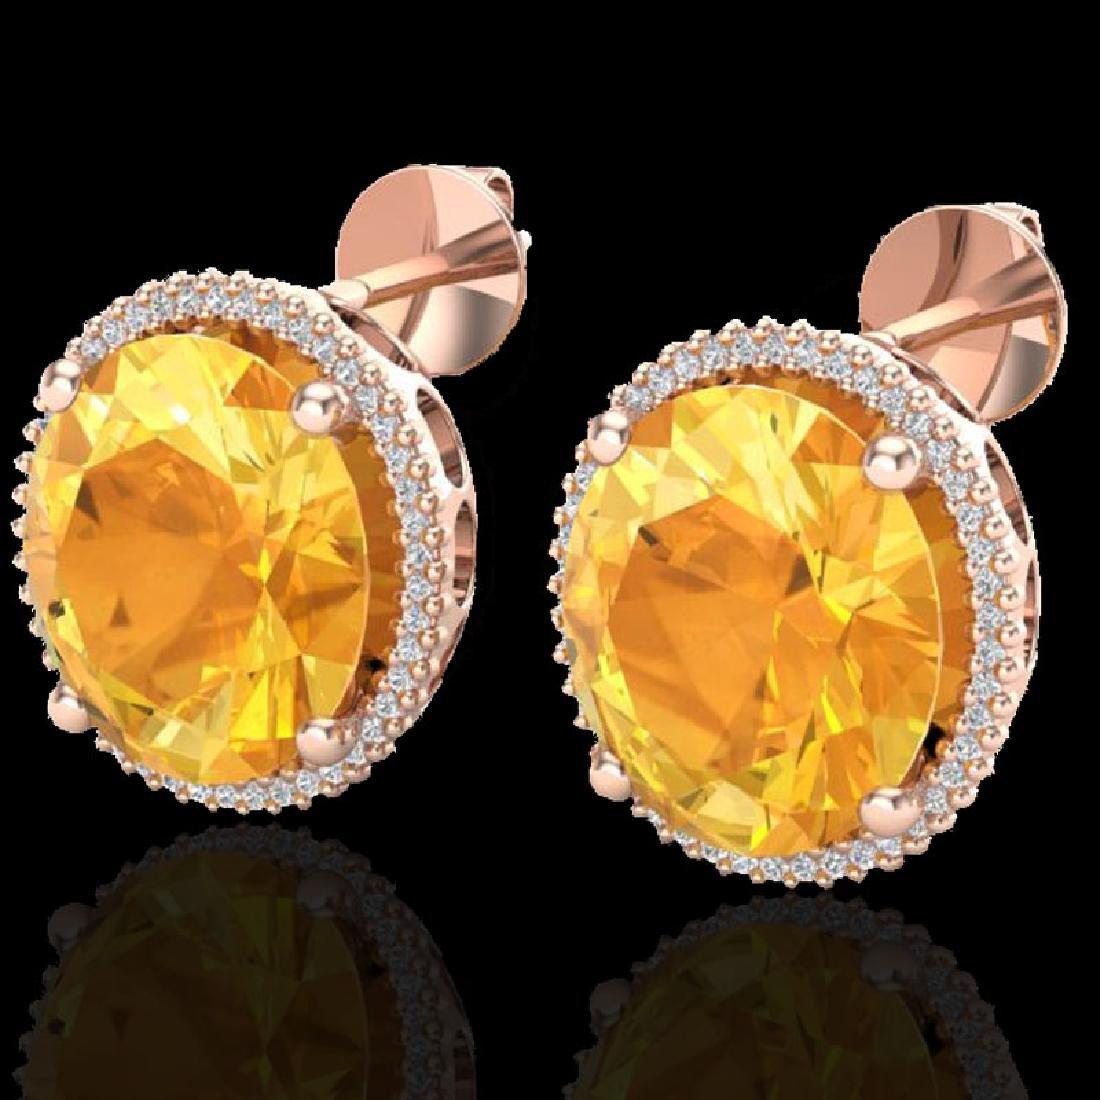 20 CTW Citrine & Micro Pave VS/SI Diamond Halo Earrings